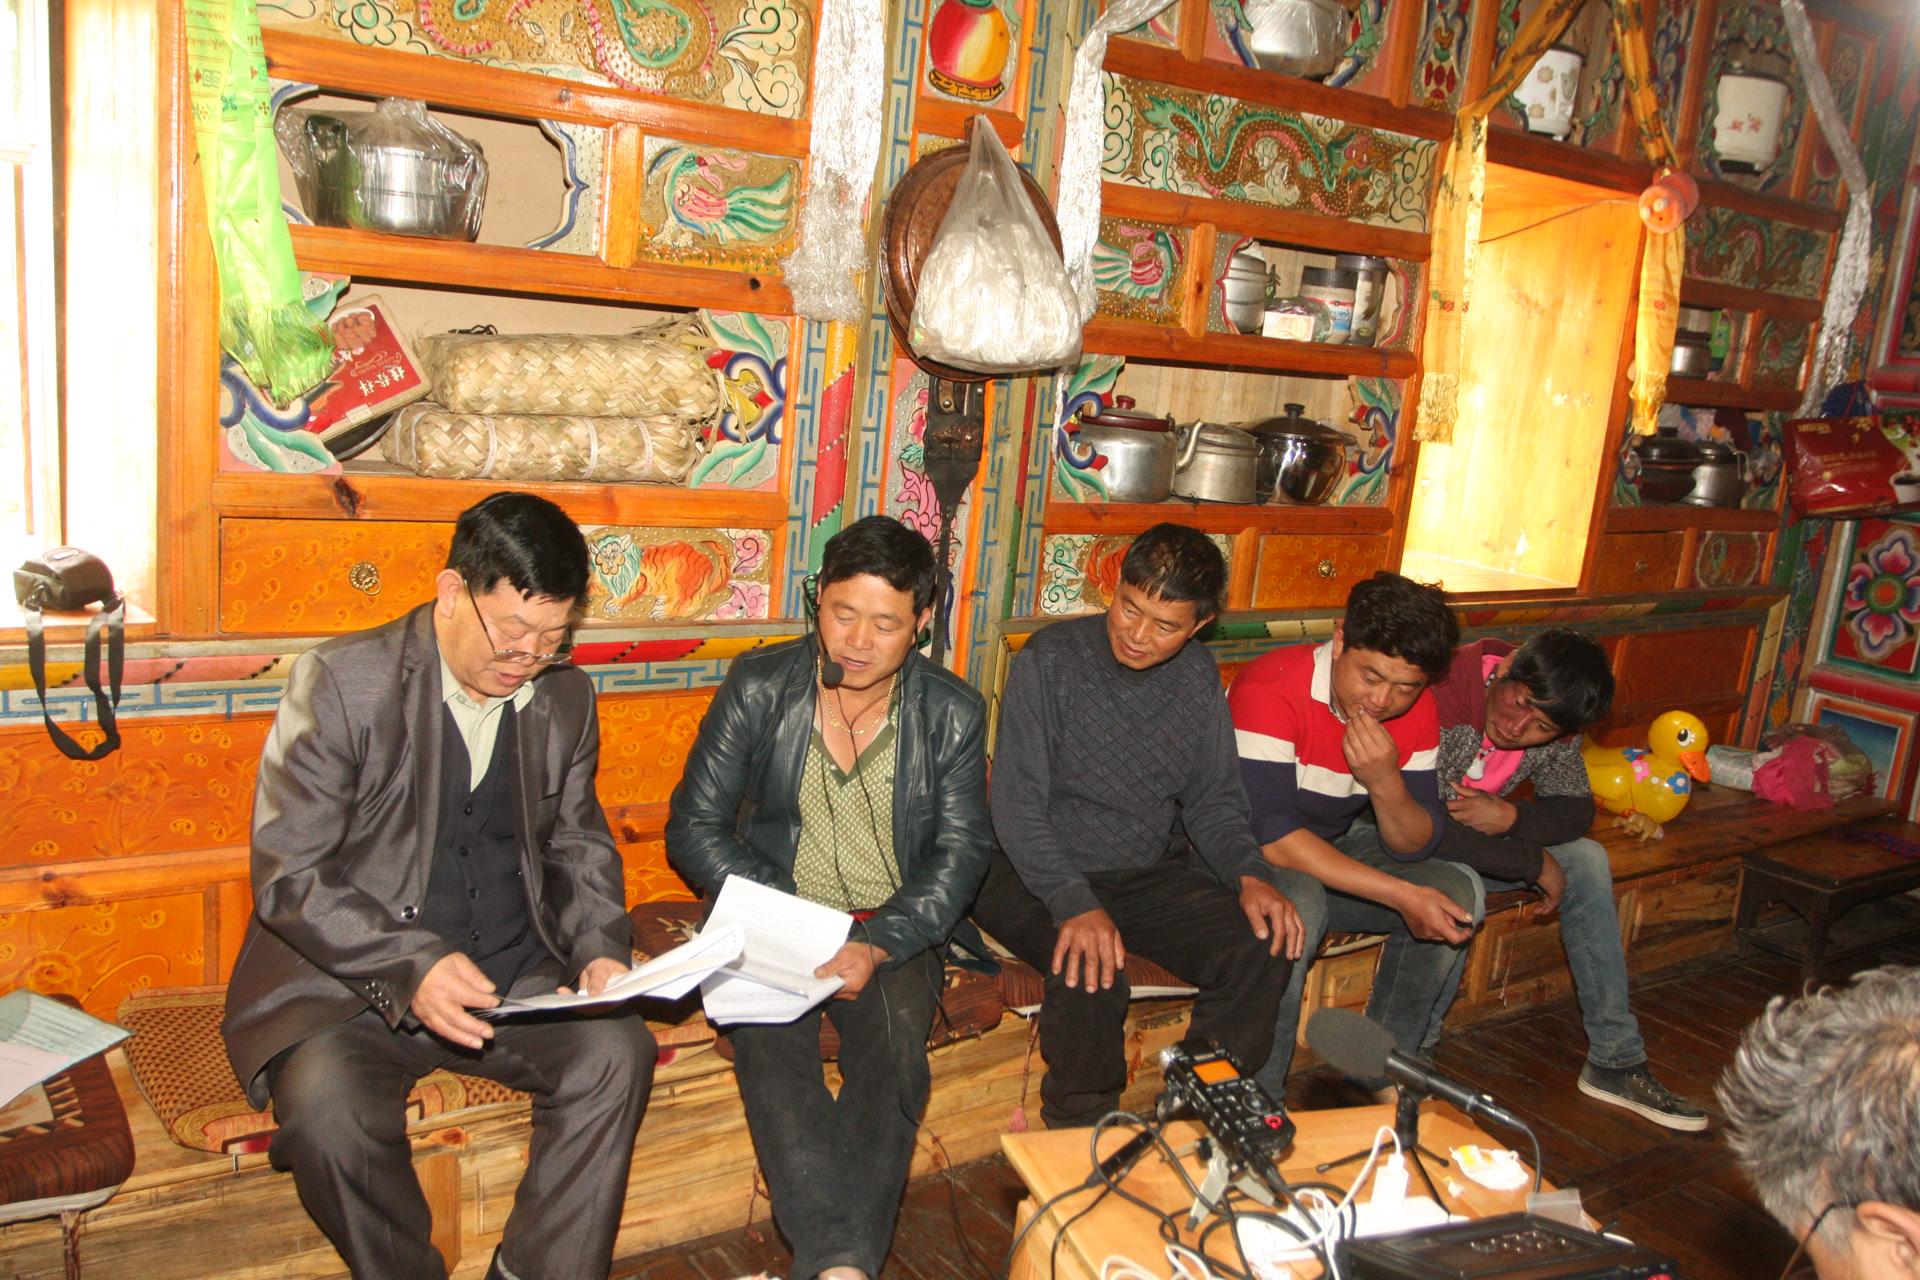 Travail de terrain sur la langue xumi, canton de Shuiluo, comté de Muli, mars 2015 ; photo Wang Dehe (王德和)